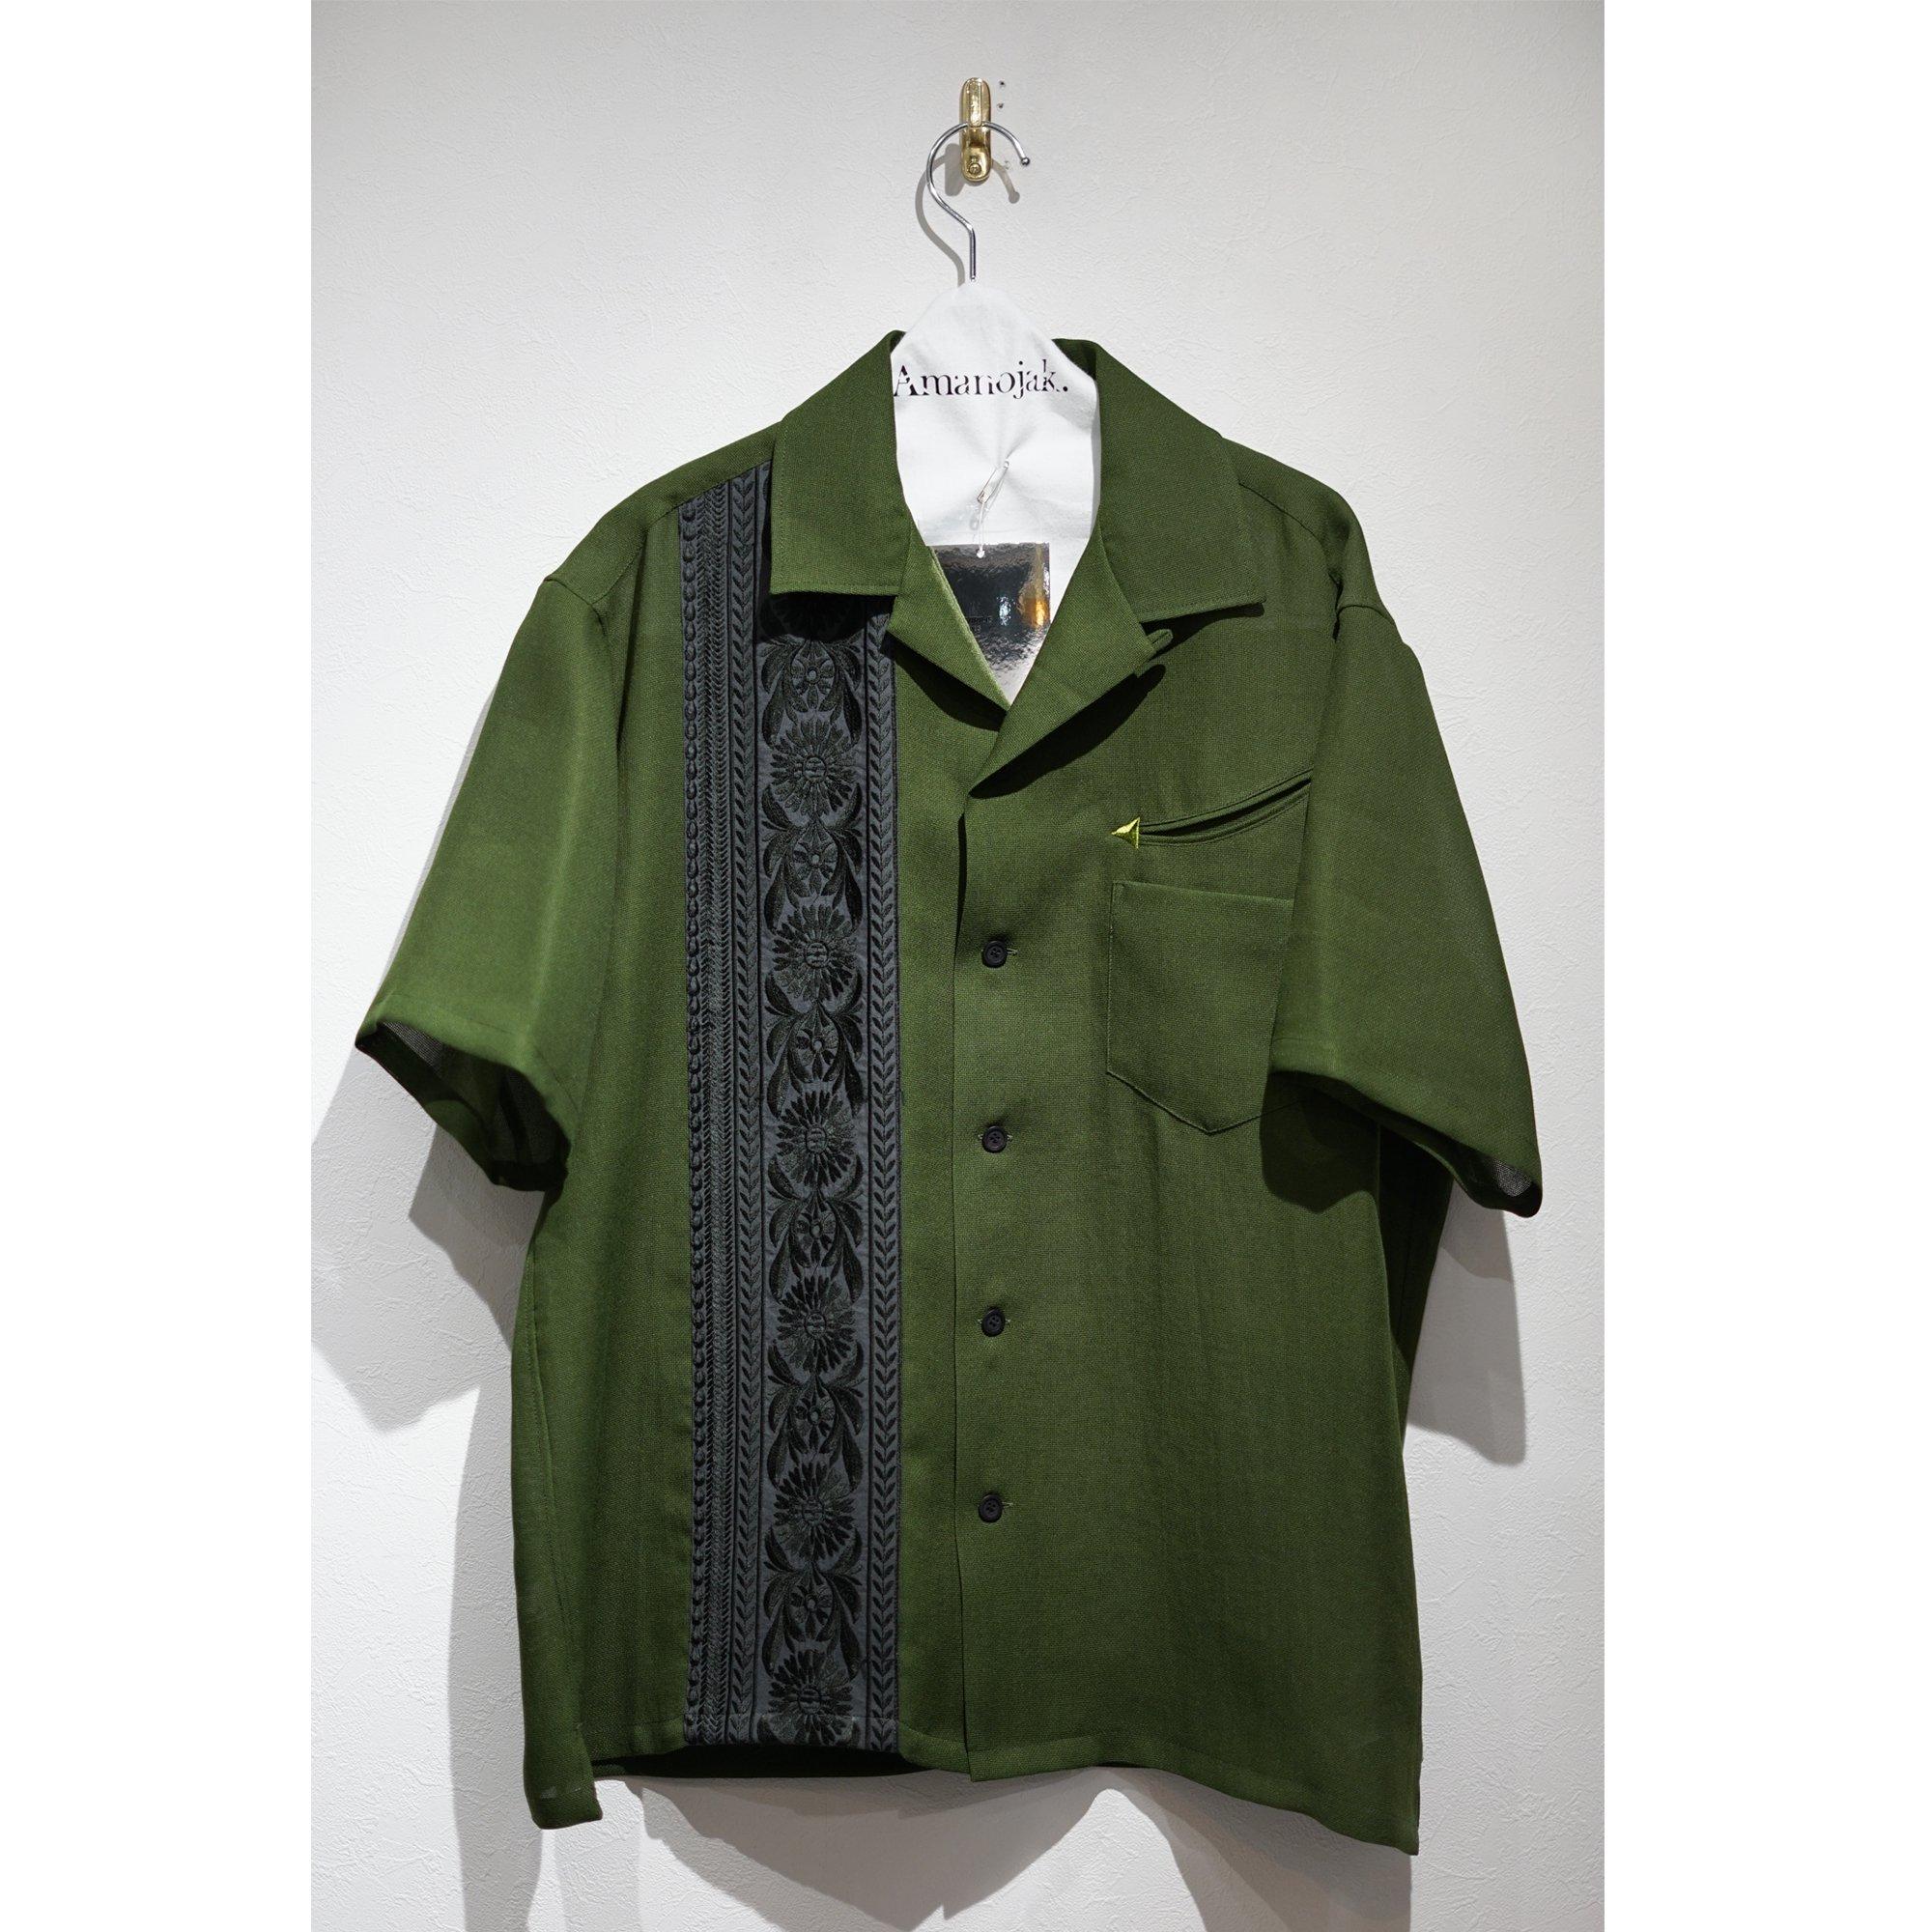 TOGA VIRILLIS-ALDENTE MESH SHIRTS S/S GREEN